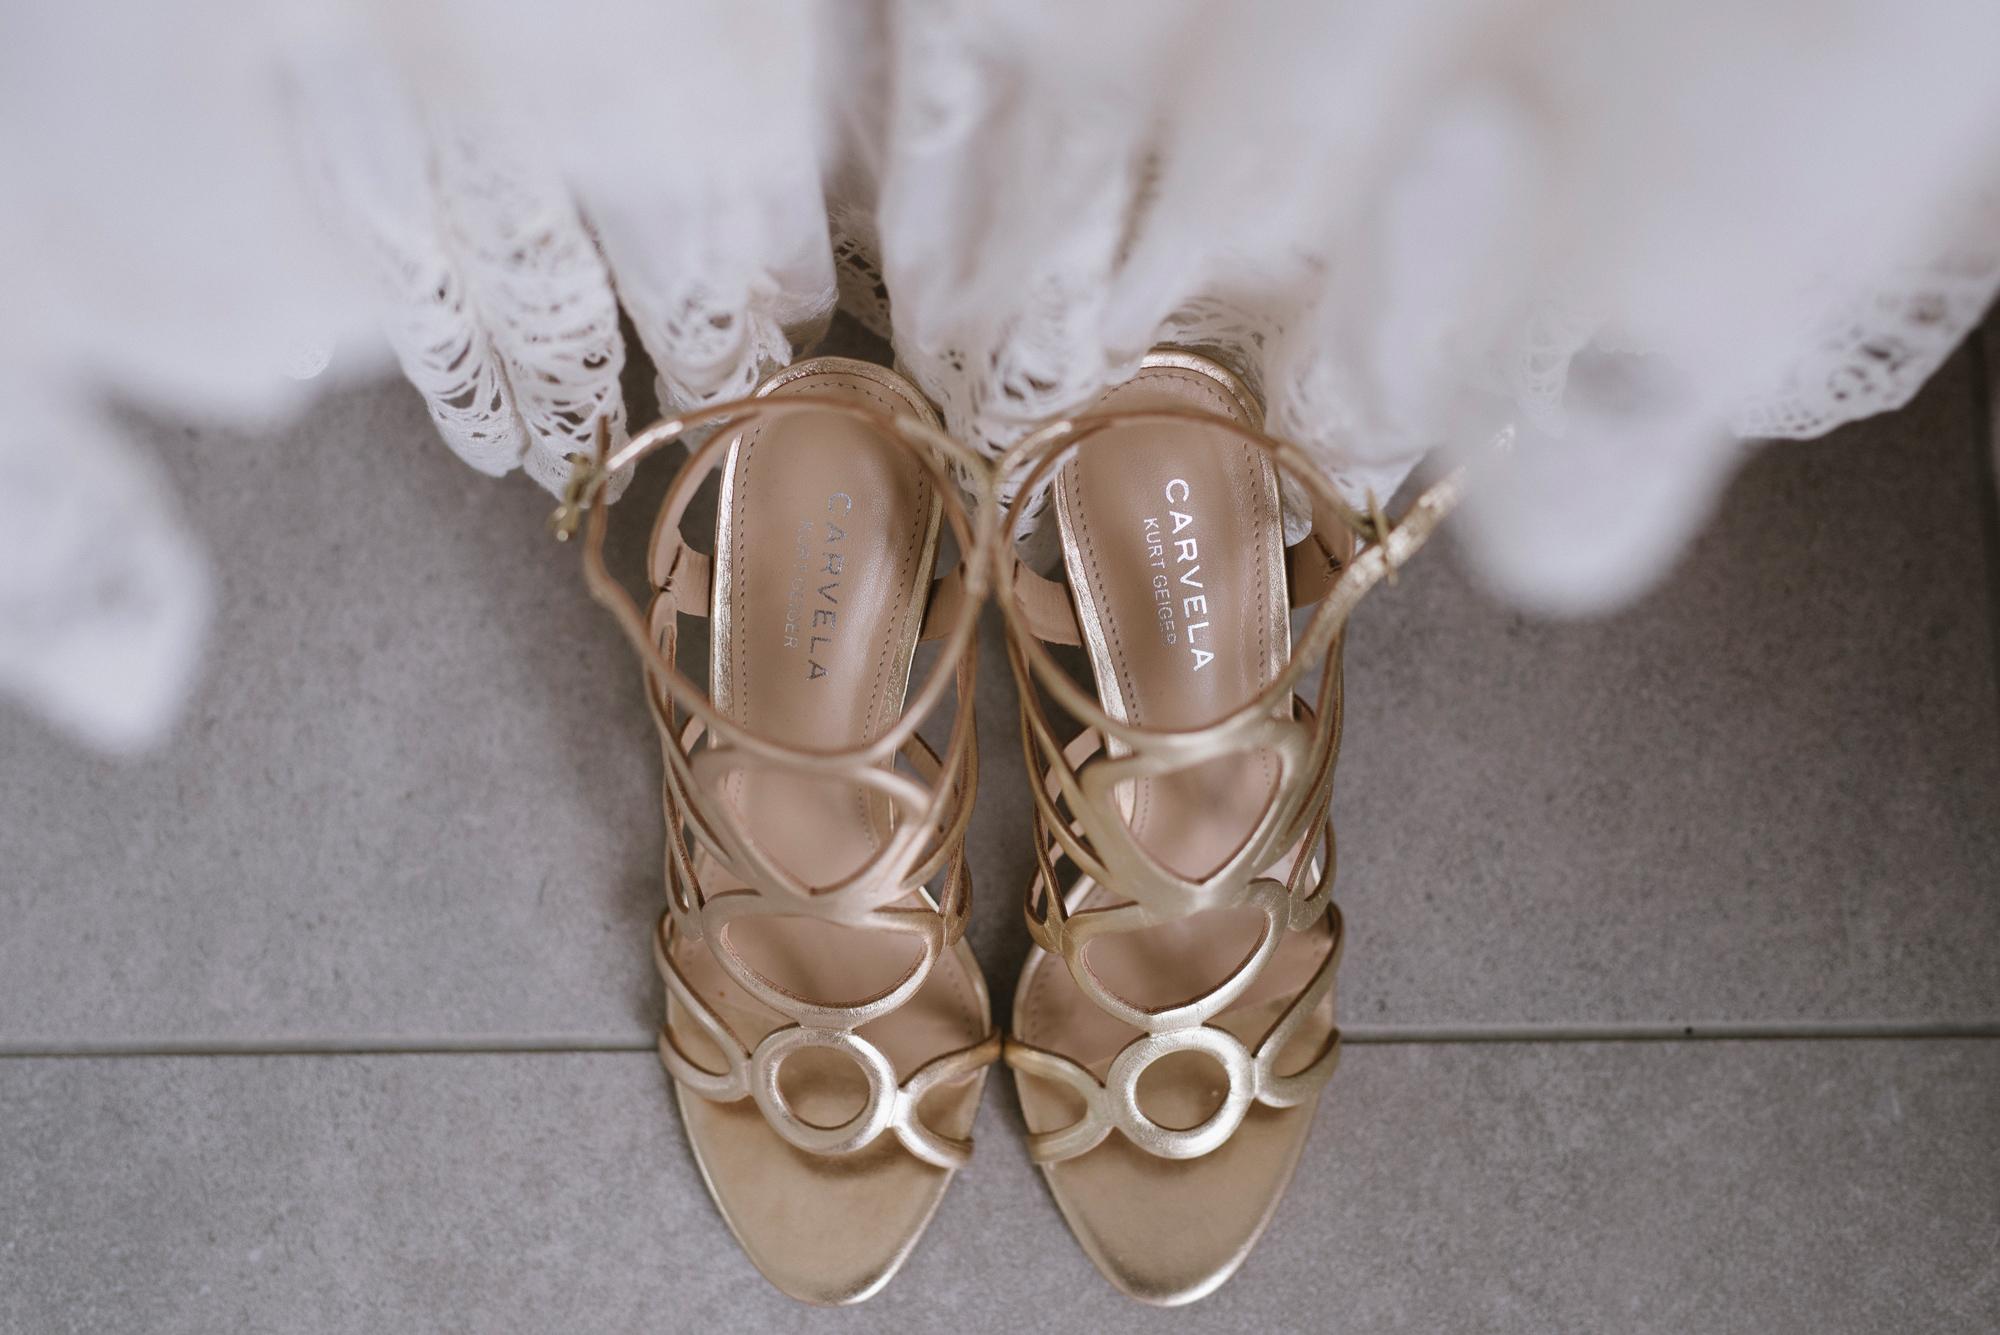 ghan_house_Wedding_Sarah_Fyffe_wedding_photographyer_1.jpg